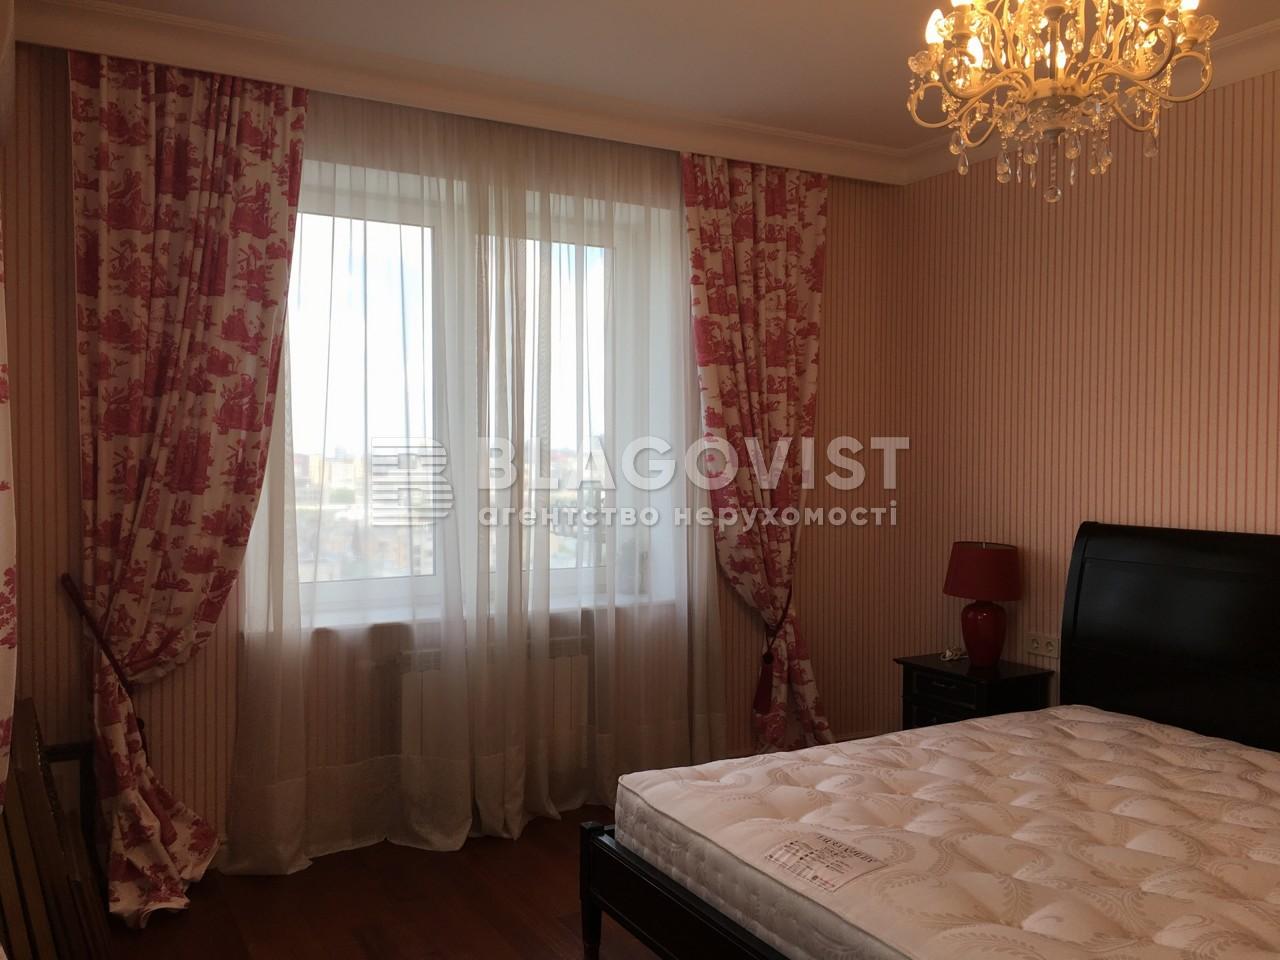 Квартира F-40122, Сечевых Стрельцов (Артема), 52а, Киев - Фото 12